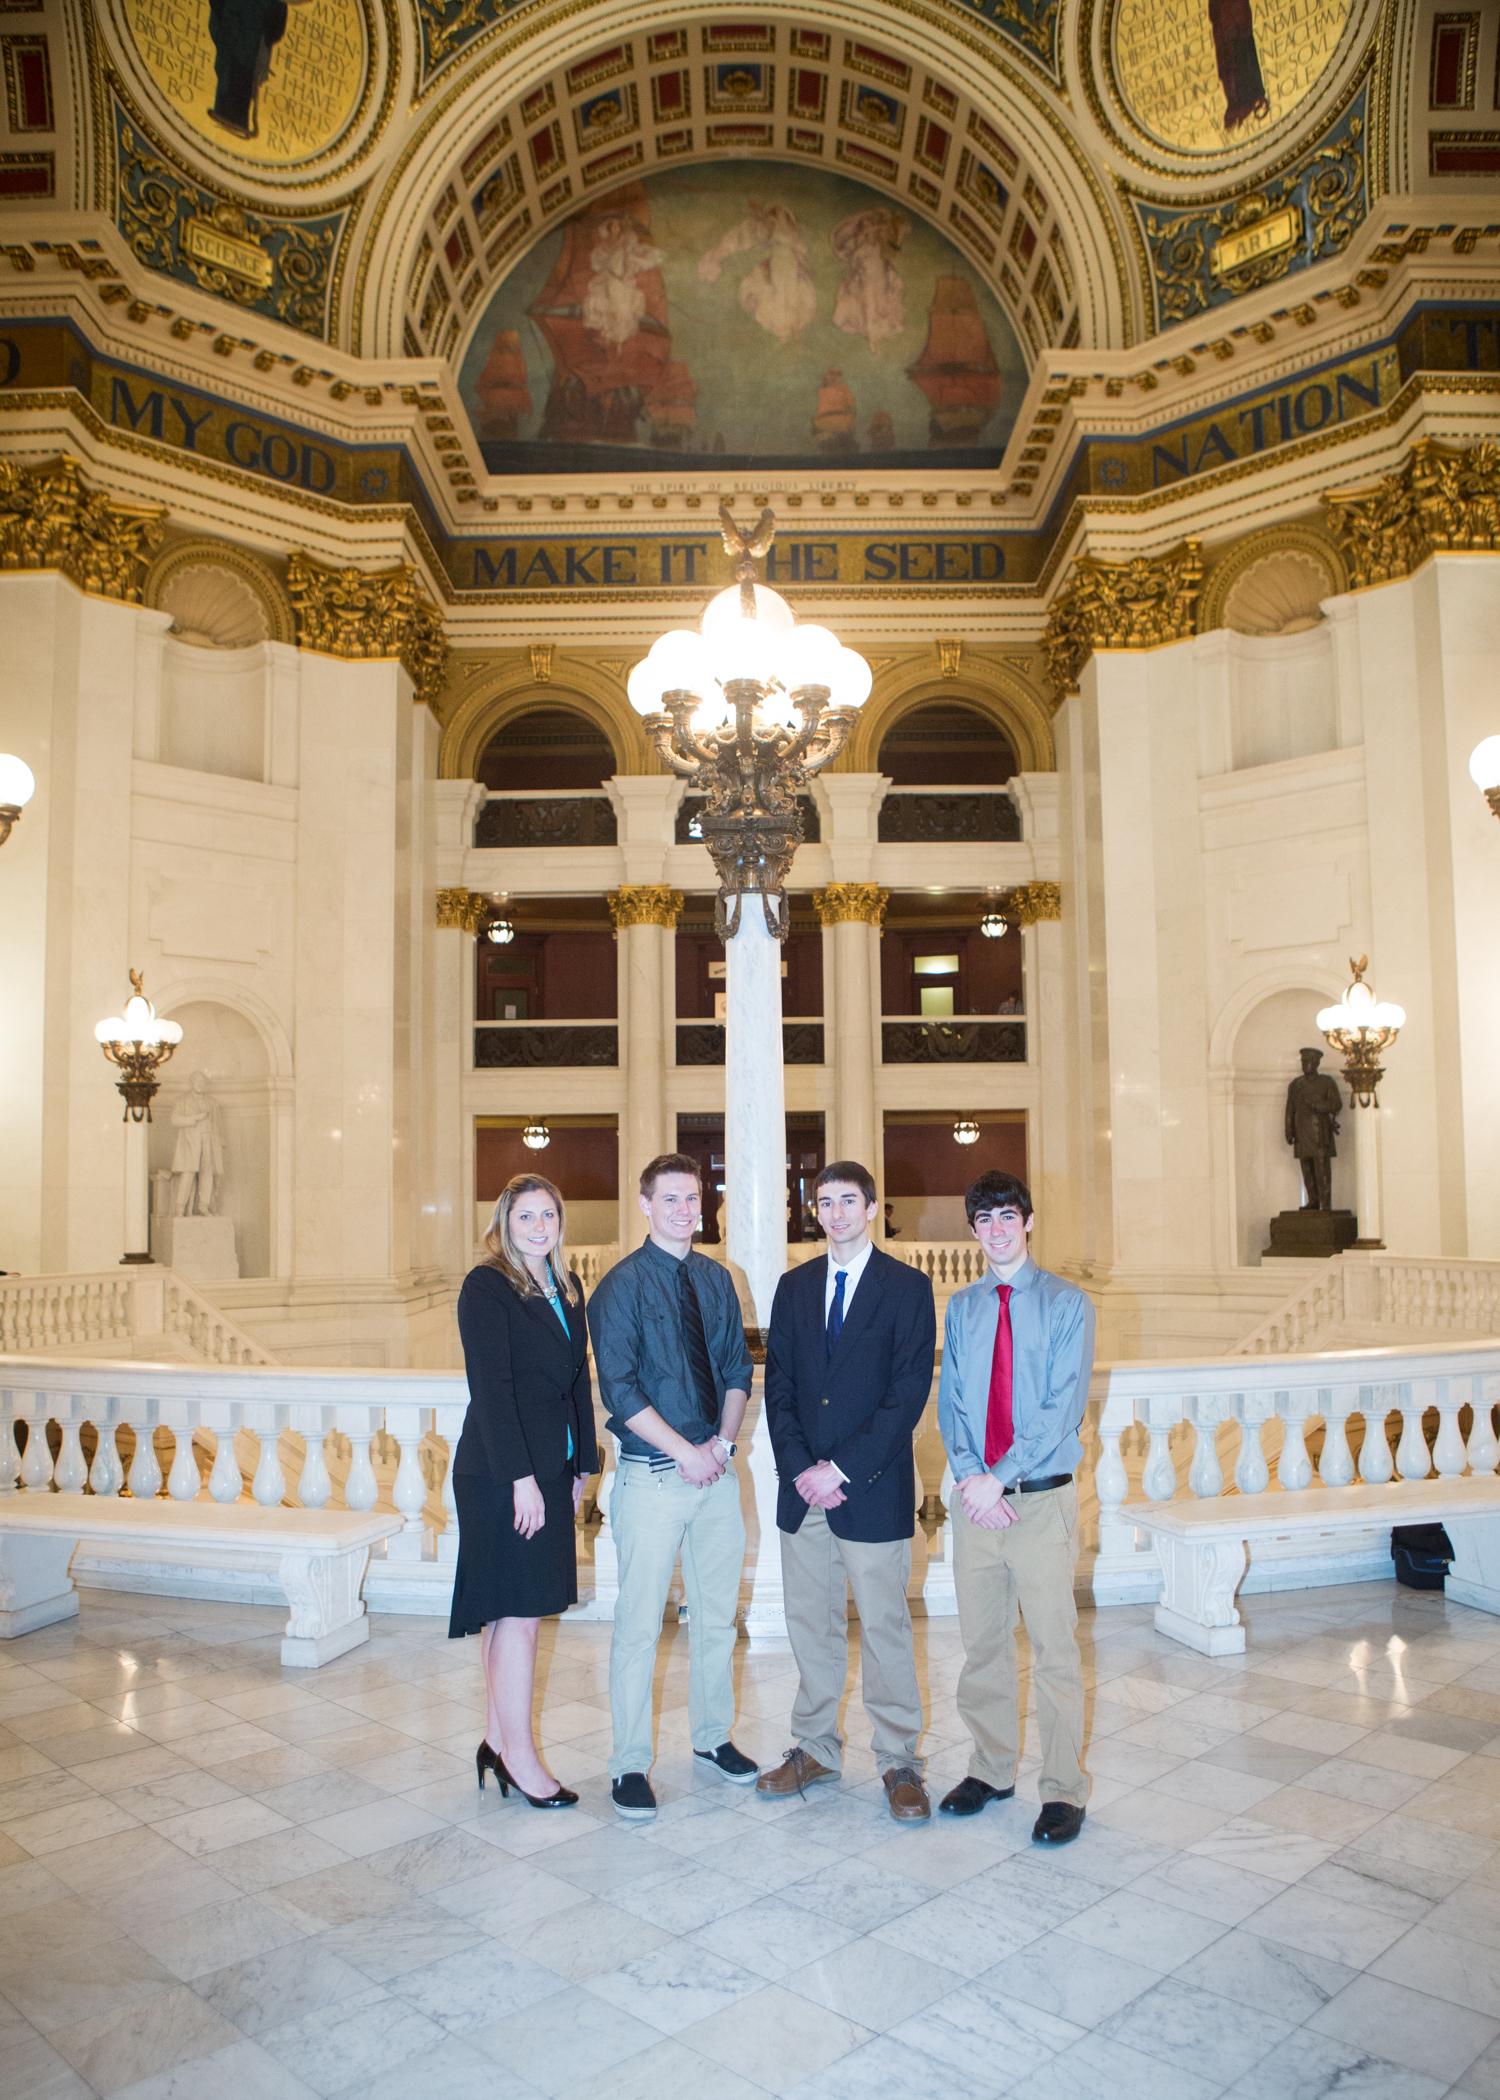 State Representative Tarah Toohil met with Penn State Hazleton students, from left, Charles Ziegmont, Robert Vitagliano and Mauro Notaro.